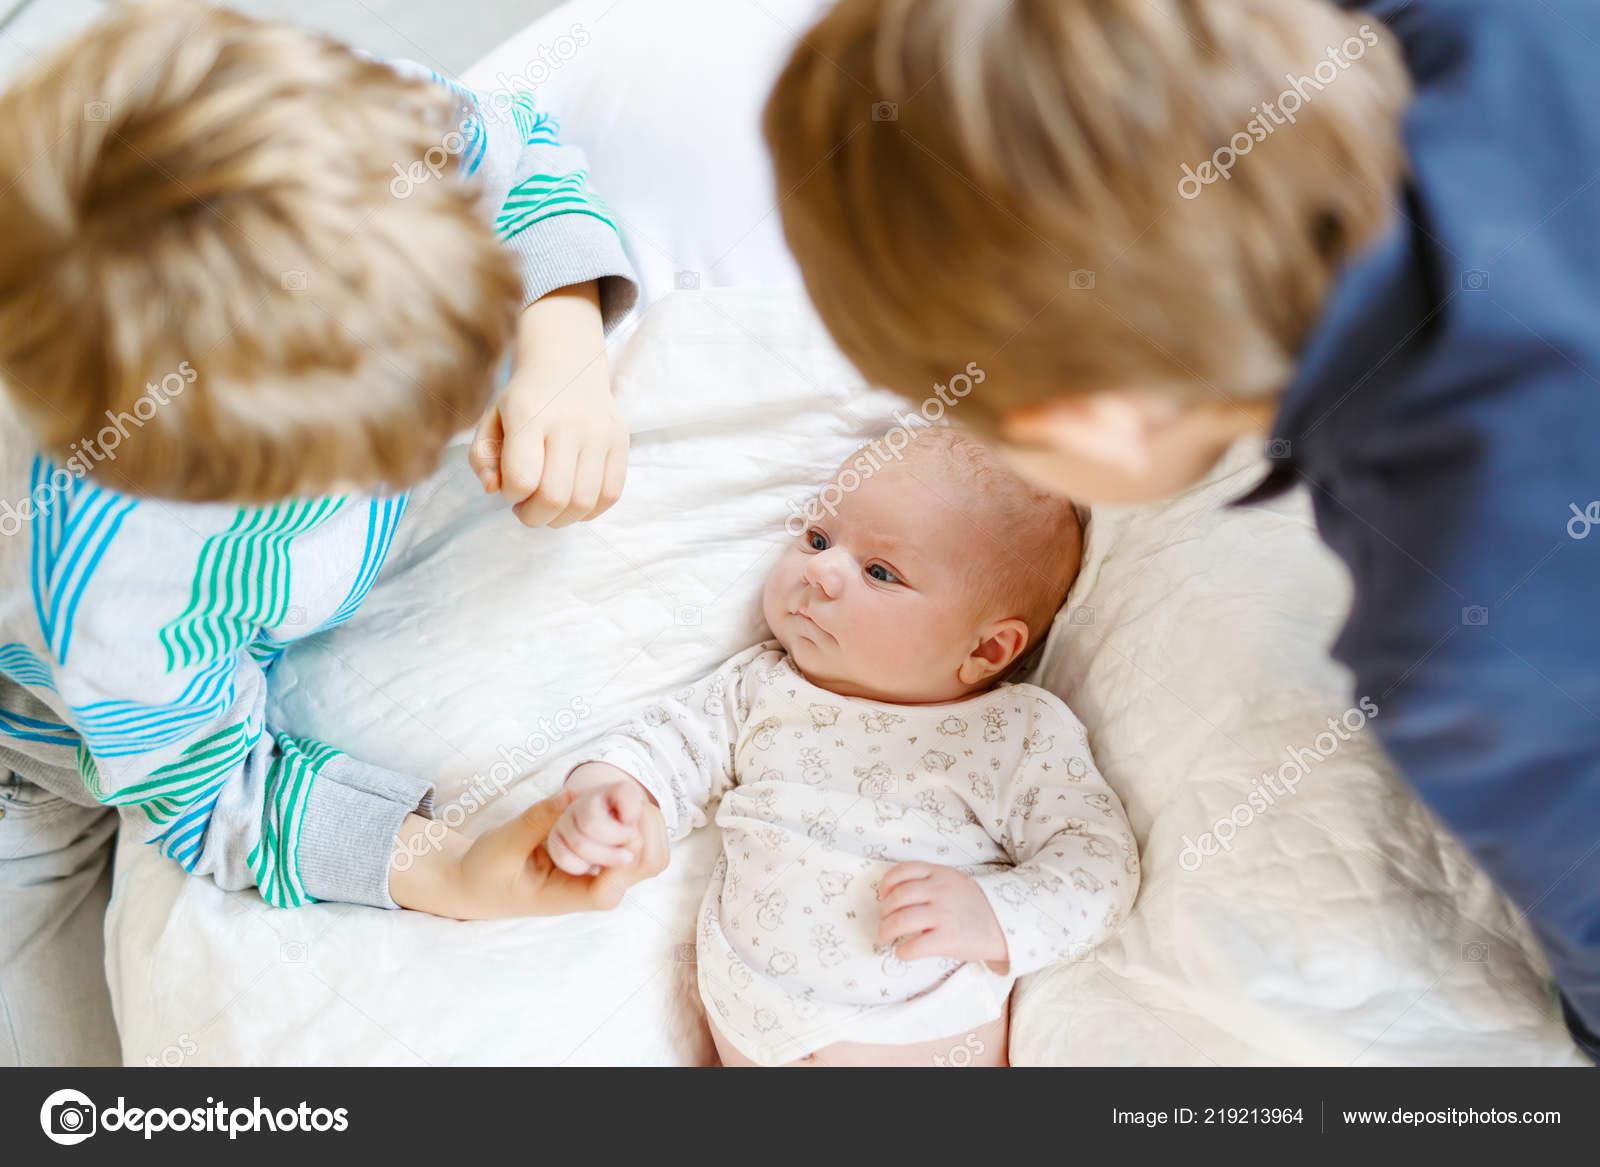 350f4d4c788 Δύο μικρά παιδιά αγόρια παίζουν με νεογέννητο μωρό αδελφή κορίτσι ...